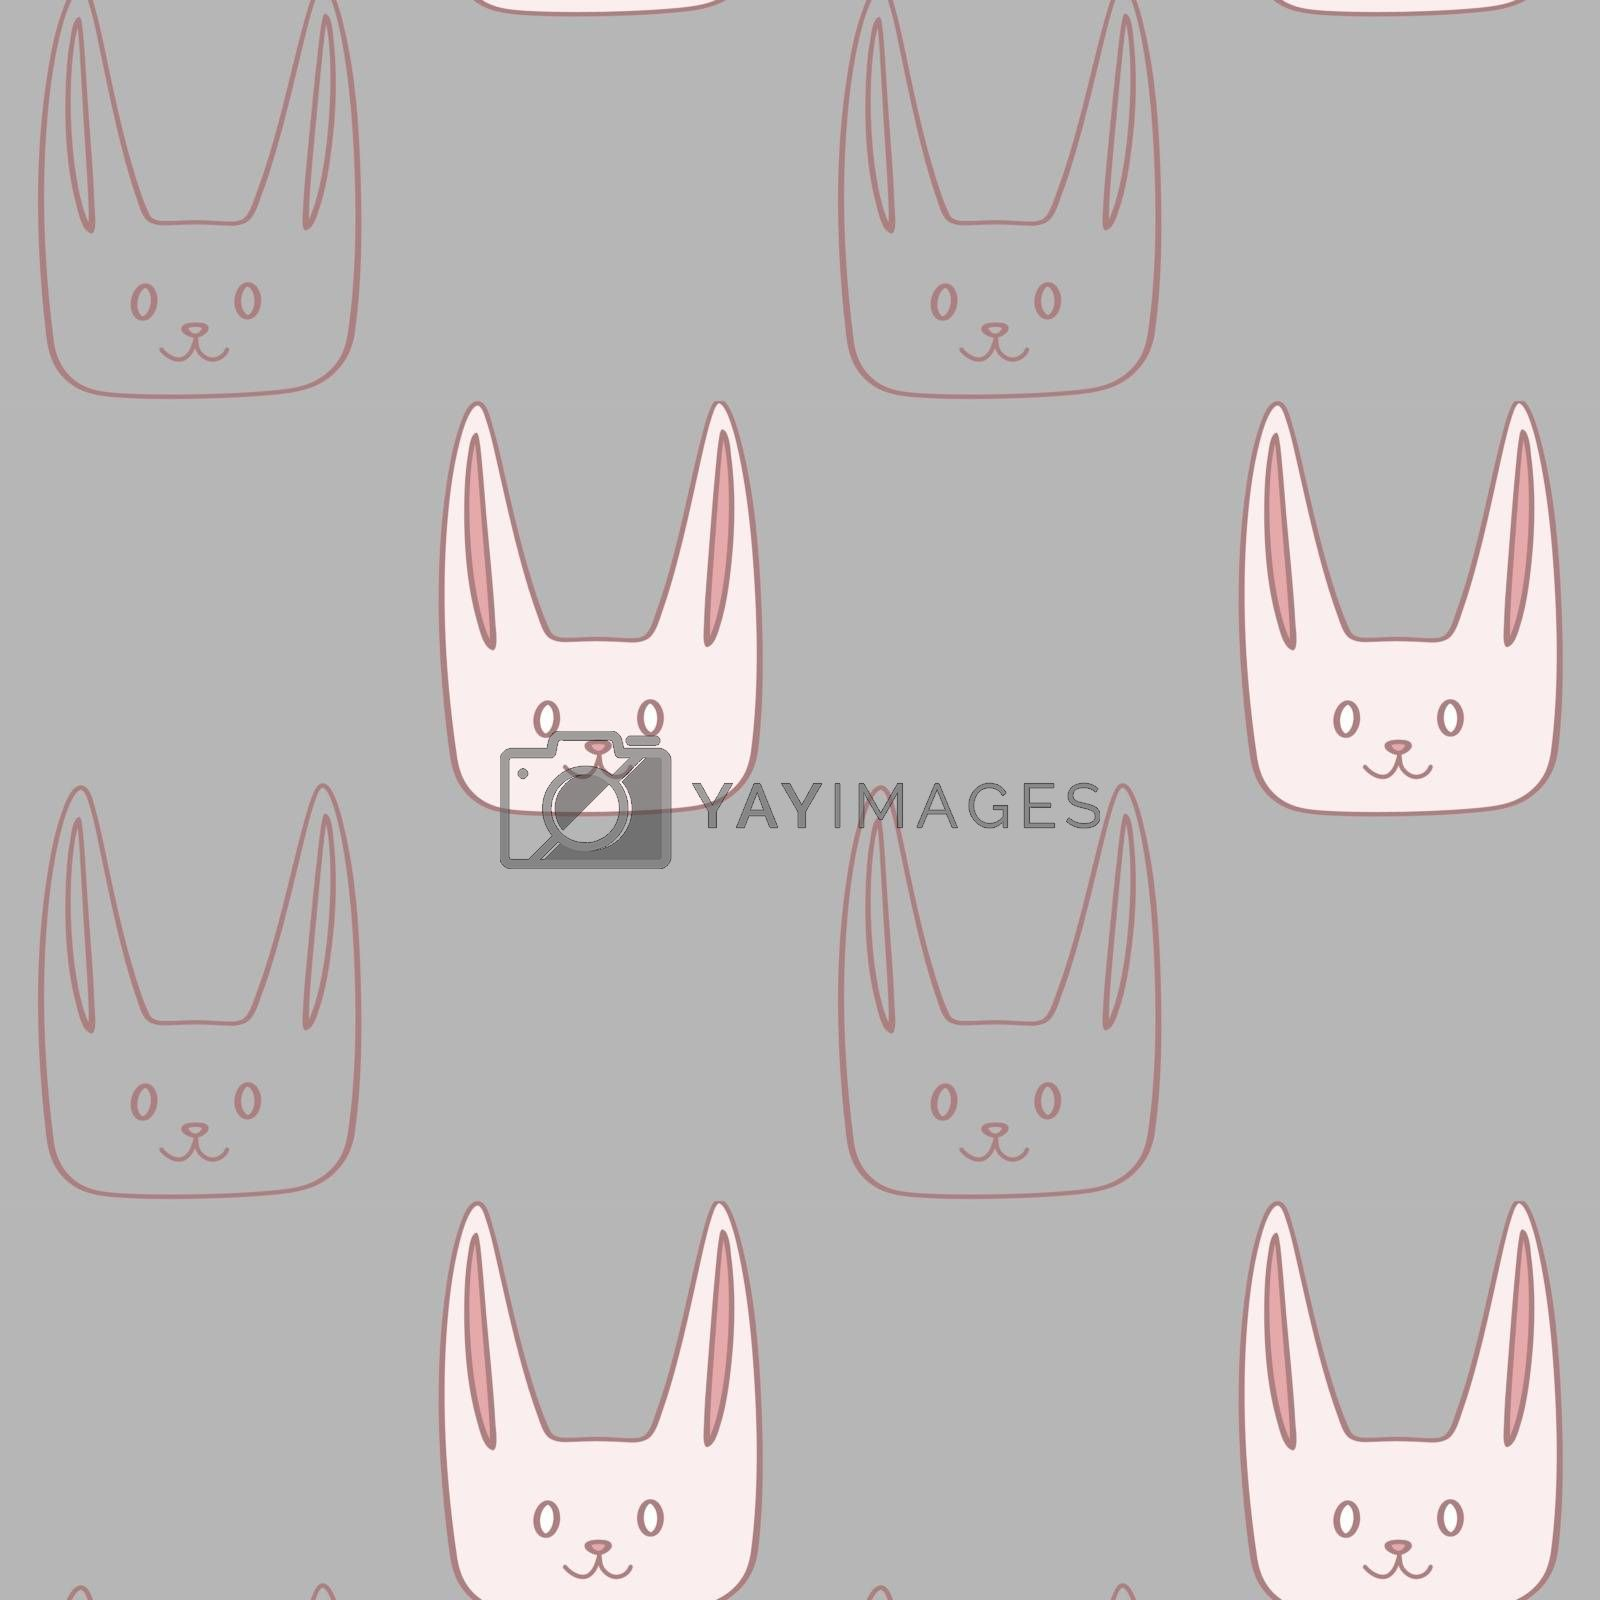 Childish cartoon seamless pattern with cute bunnies on grey background